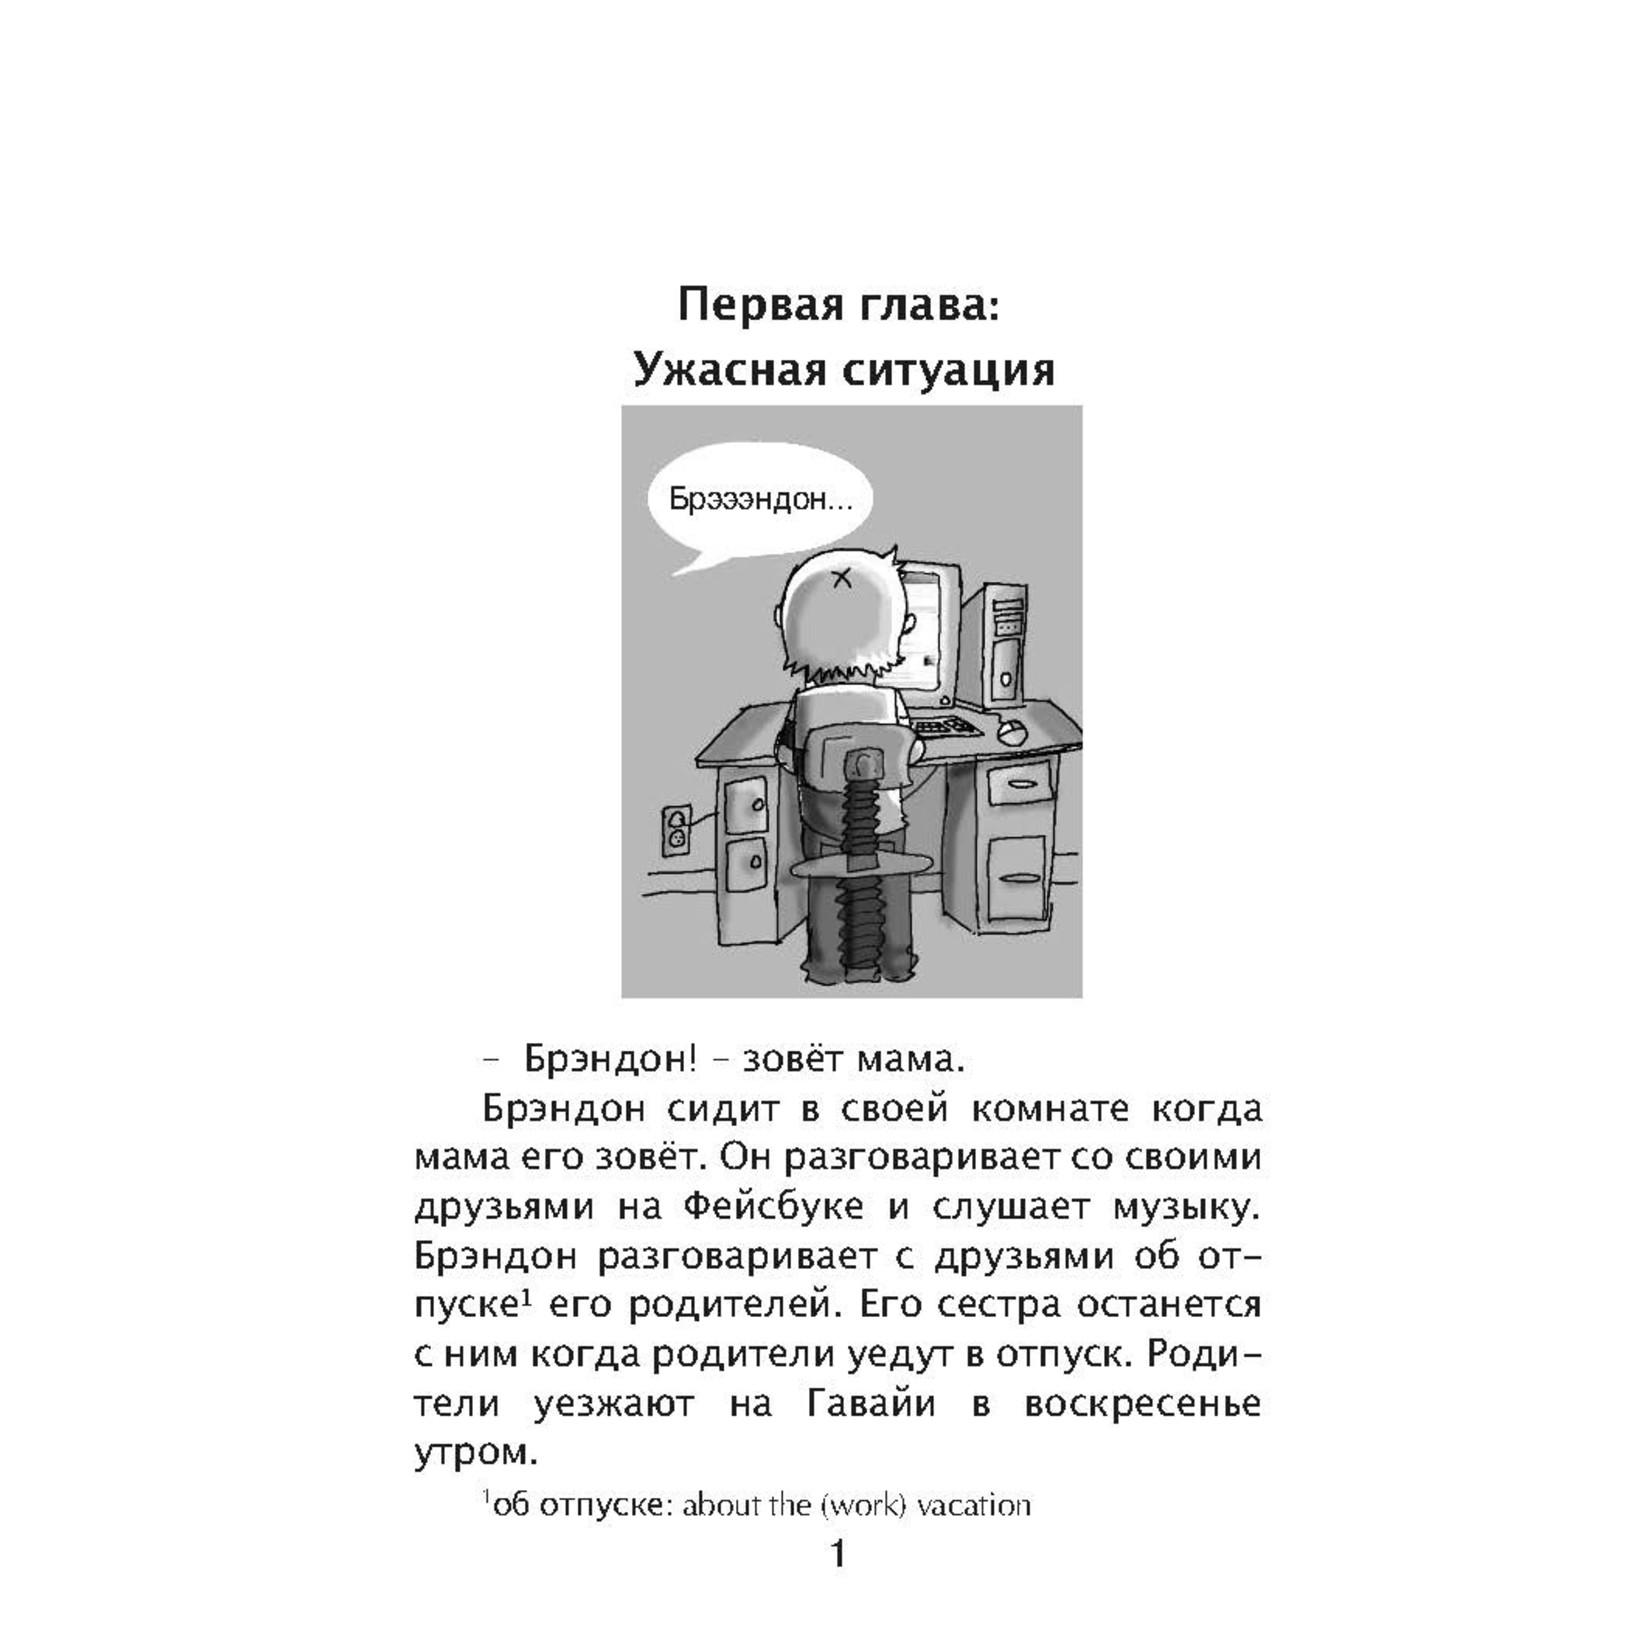 Fluency Matters Novy Gudini / новый Гудини